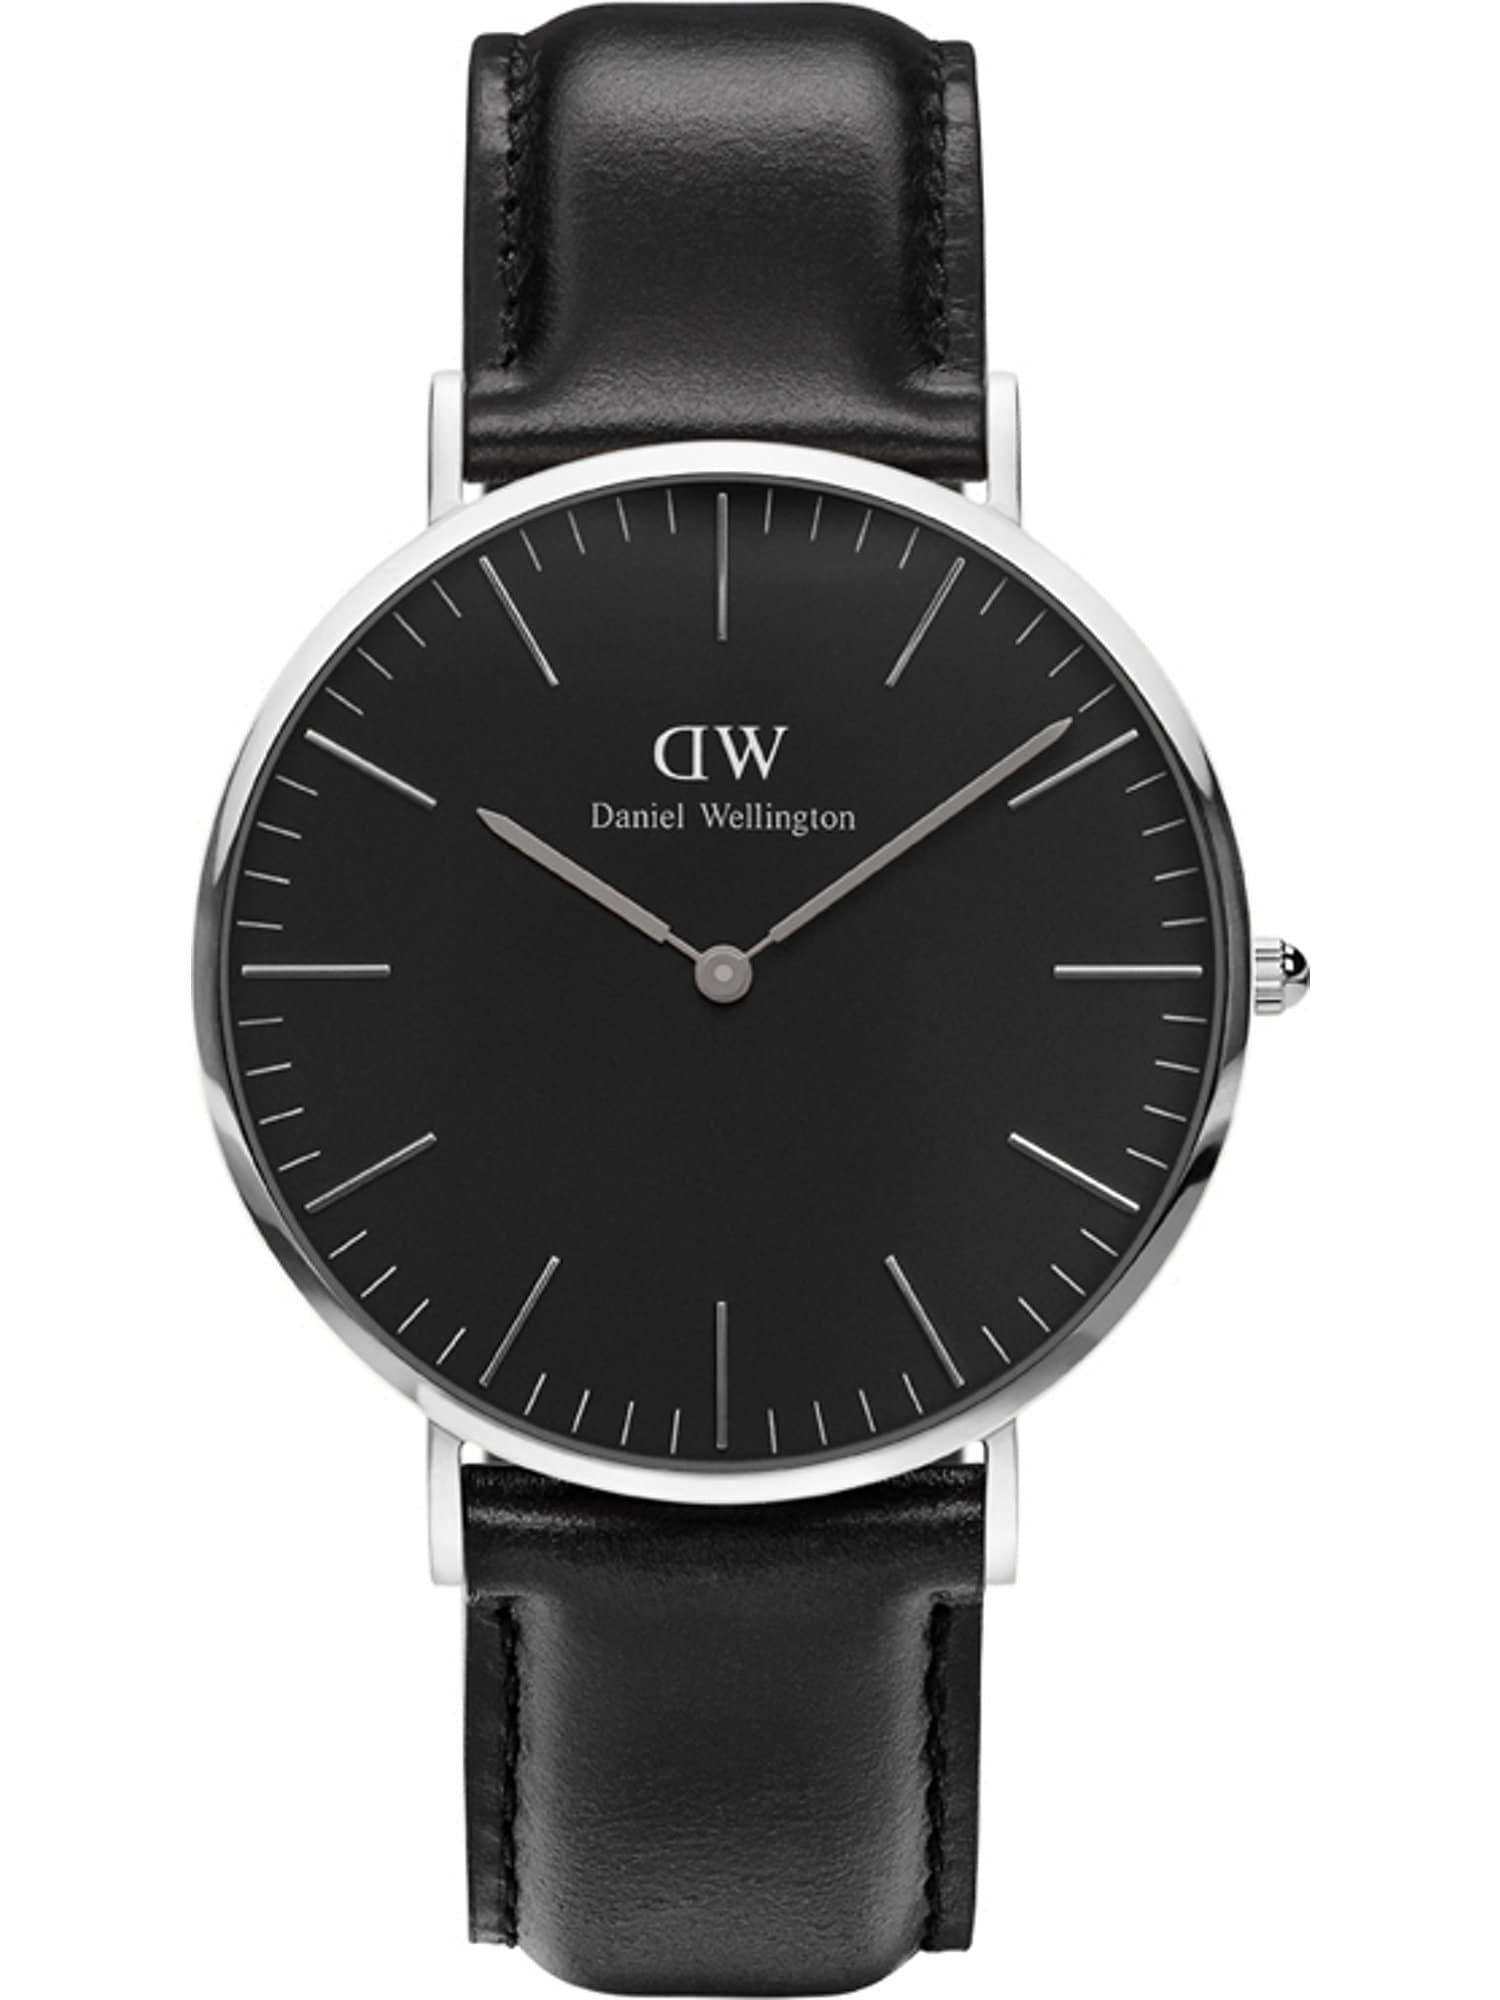 Armbanduhr   Uhren > Sonstige Armbanduhren   Schwarz - Silber   Daniel Wellington